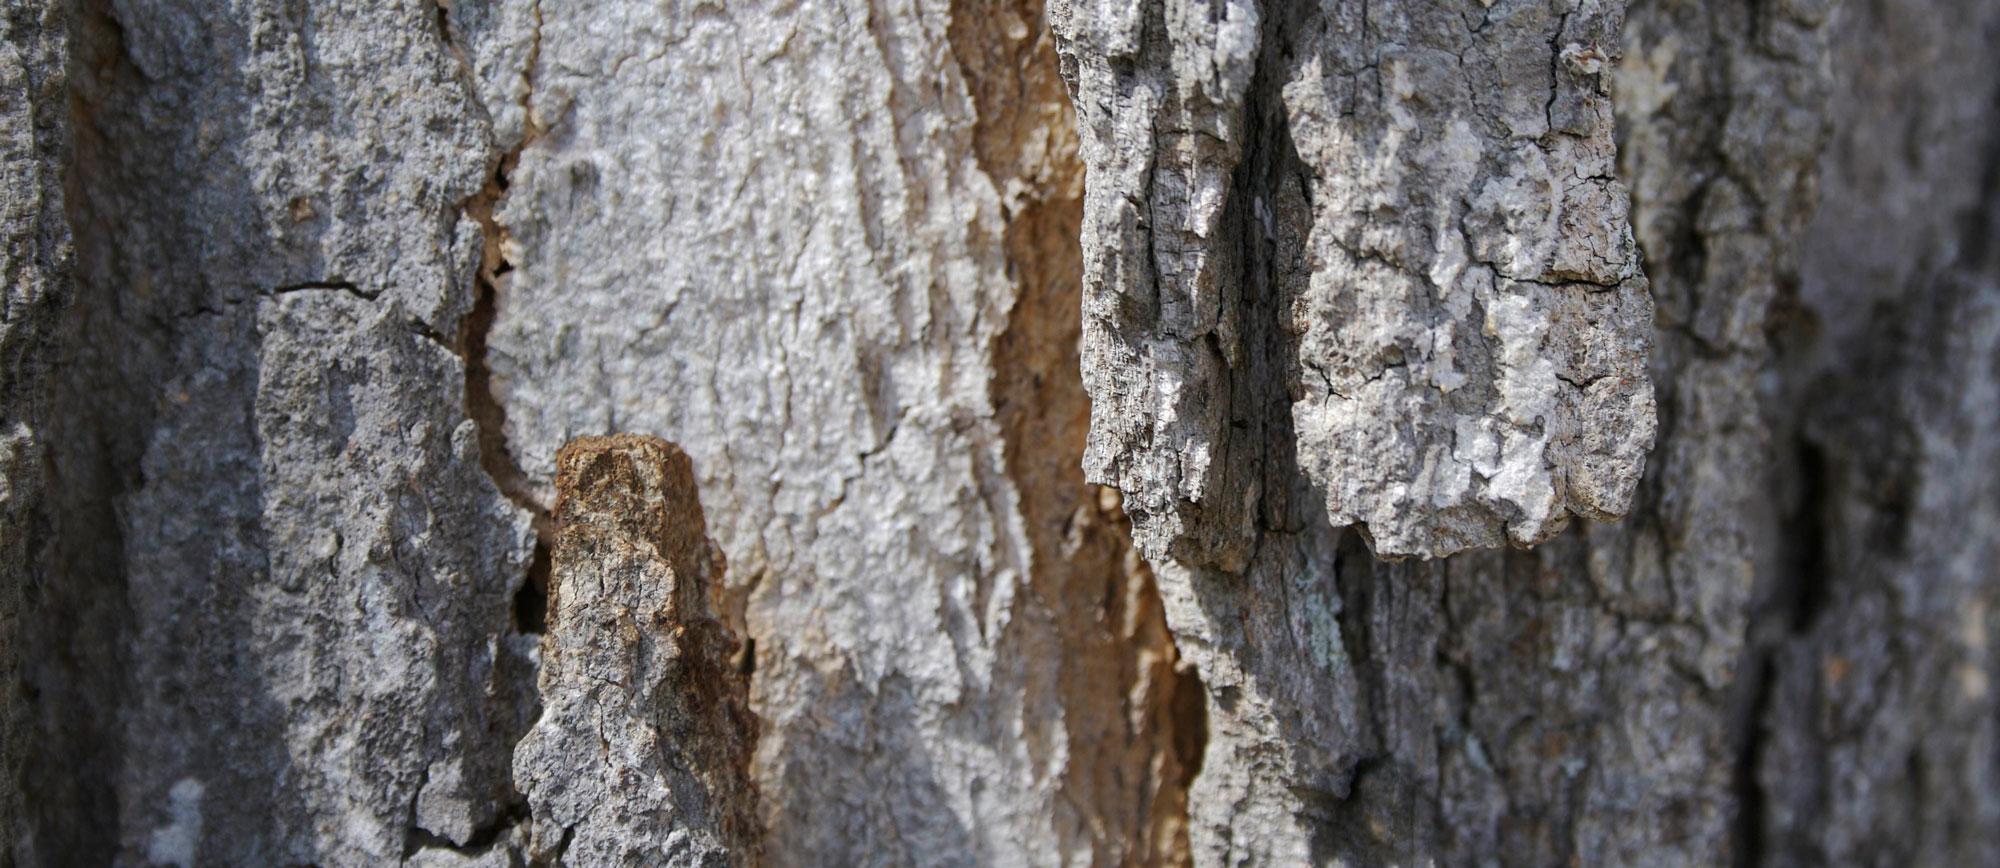 TreebarkPanorama1.jpg